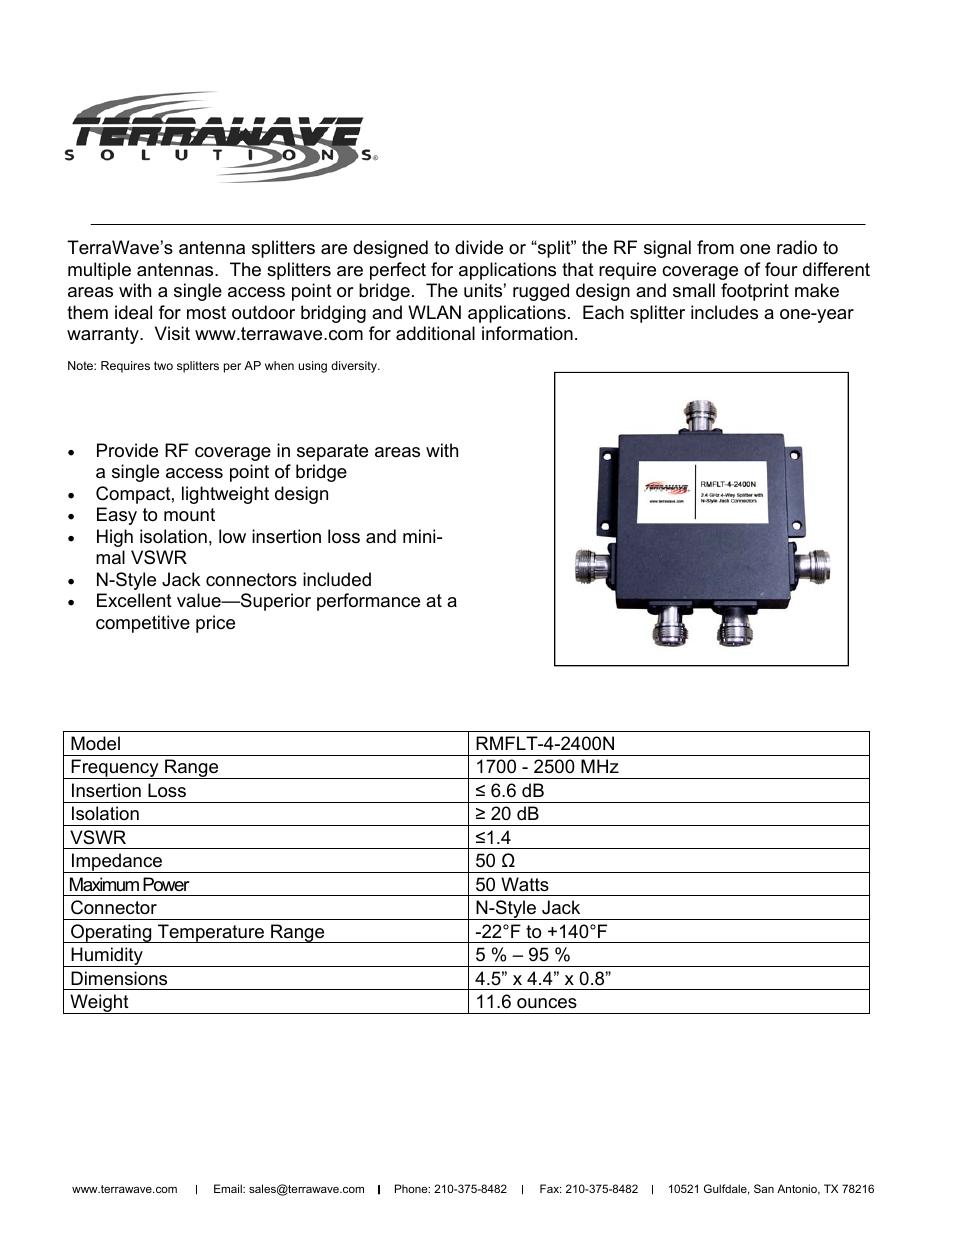 TerraWave RMFLT-4-2400N User Manual   1 page